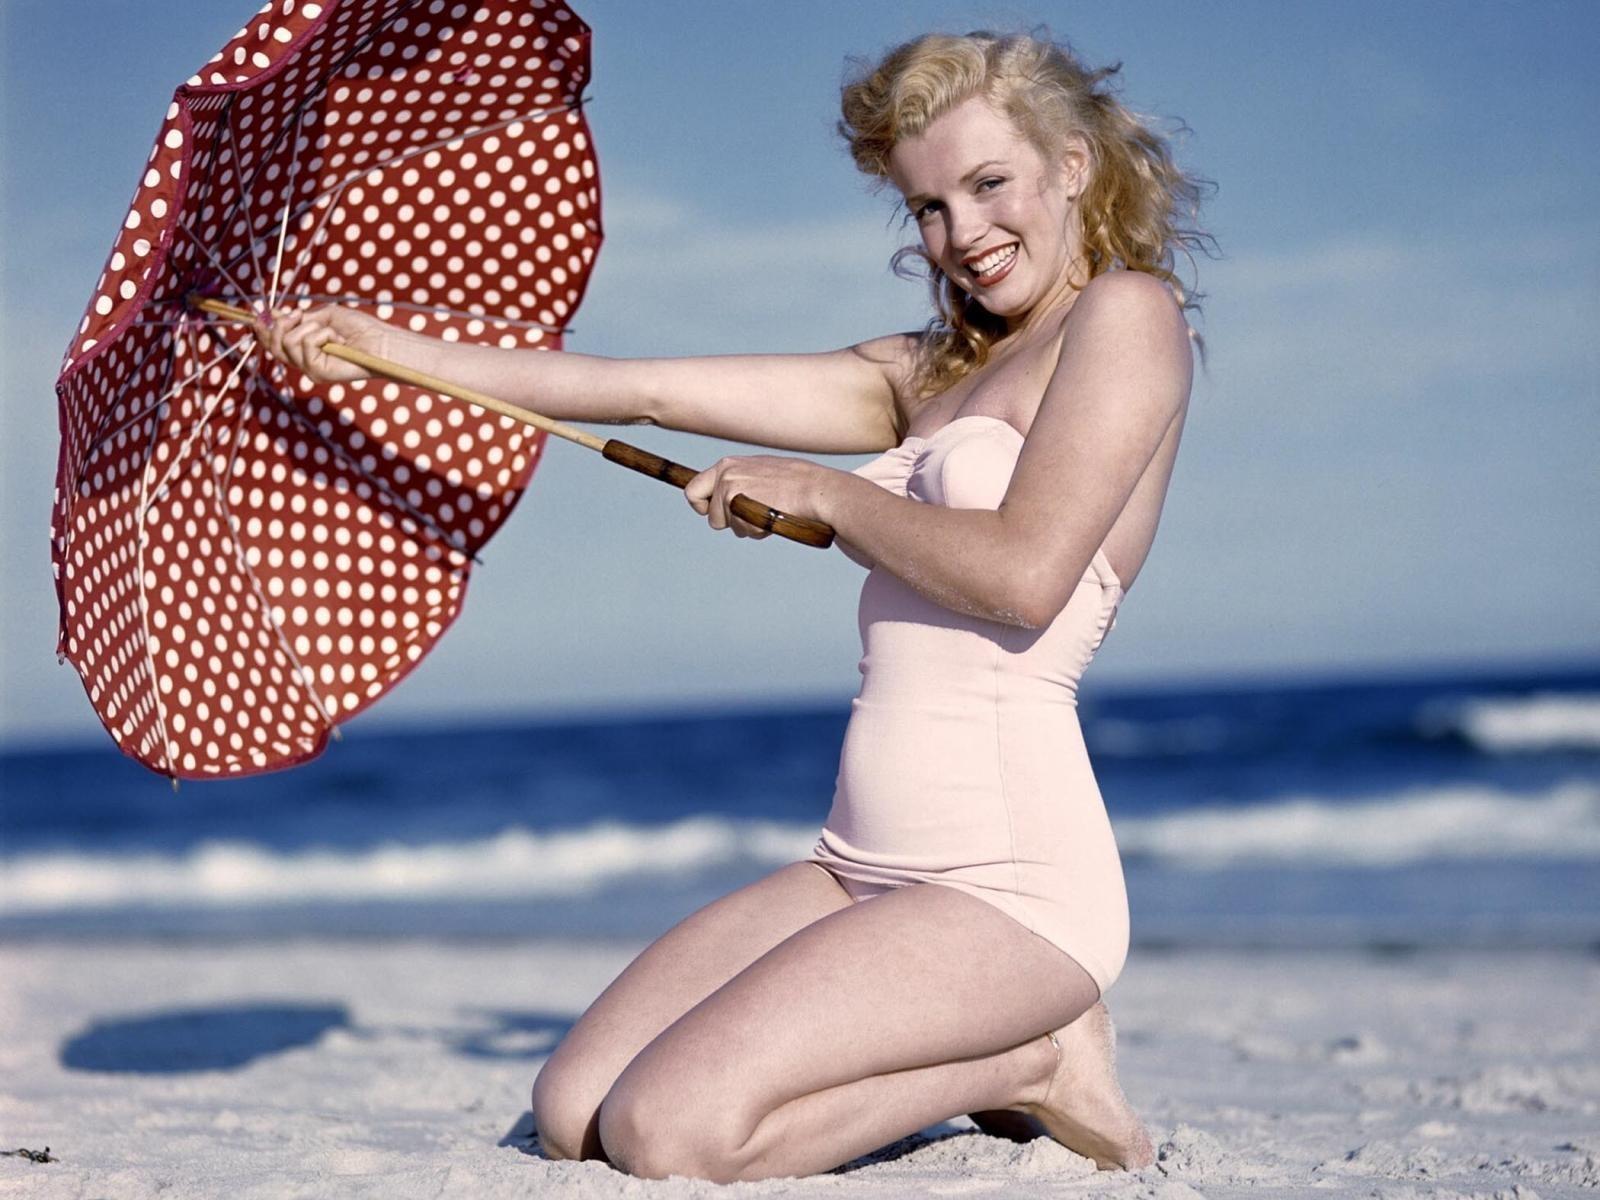 Cute Marilyn Monroe HD PicturesPhotos ImagesHigh Quality 1600x1200